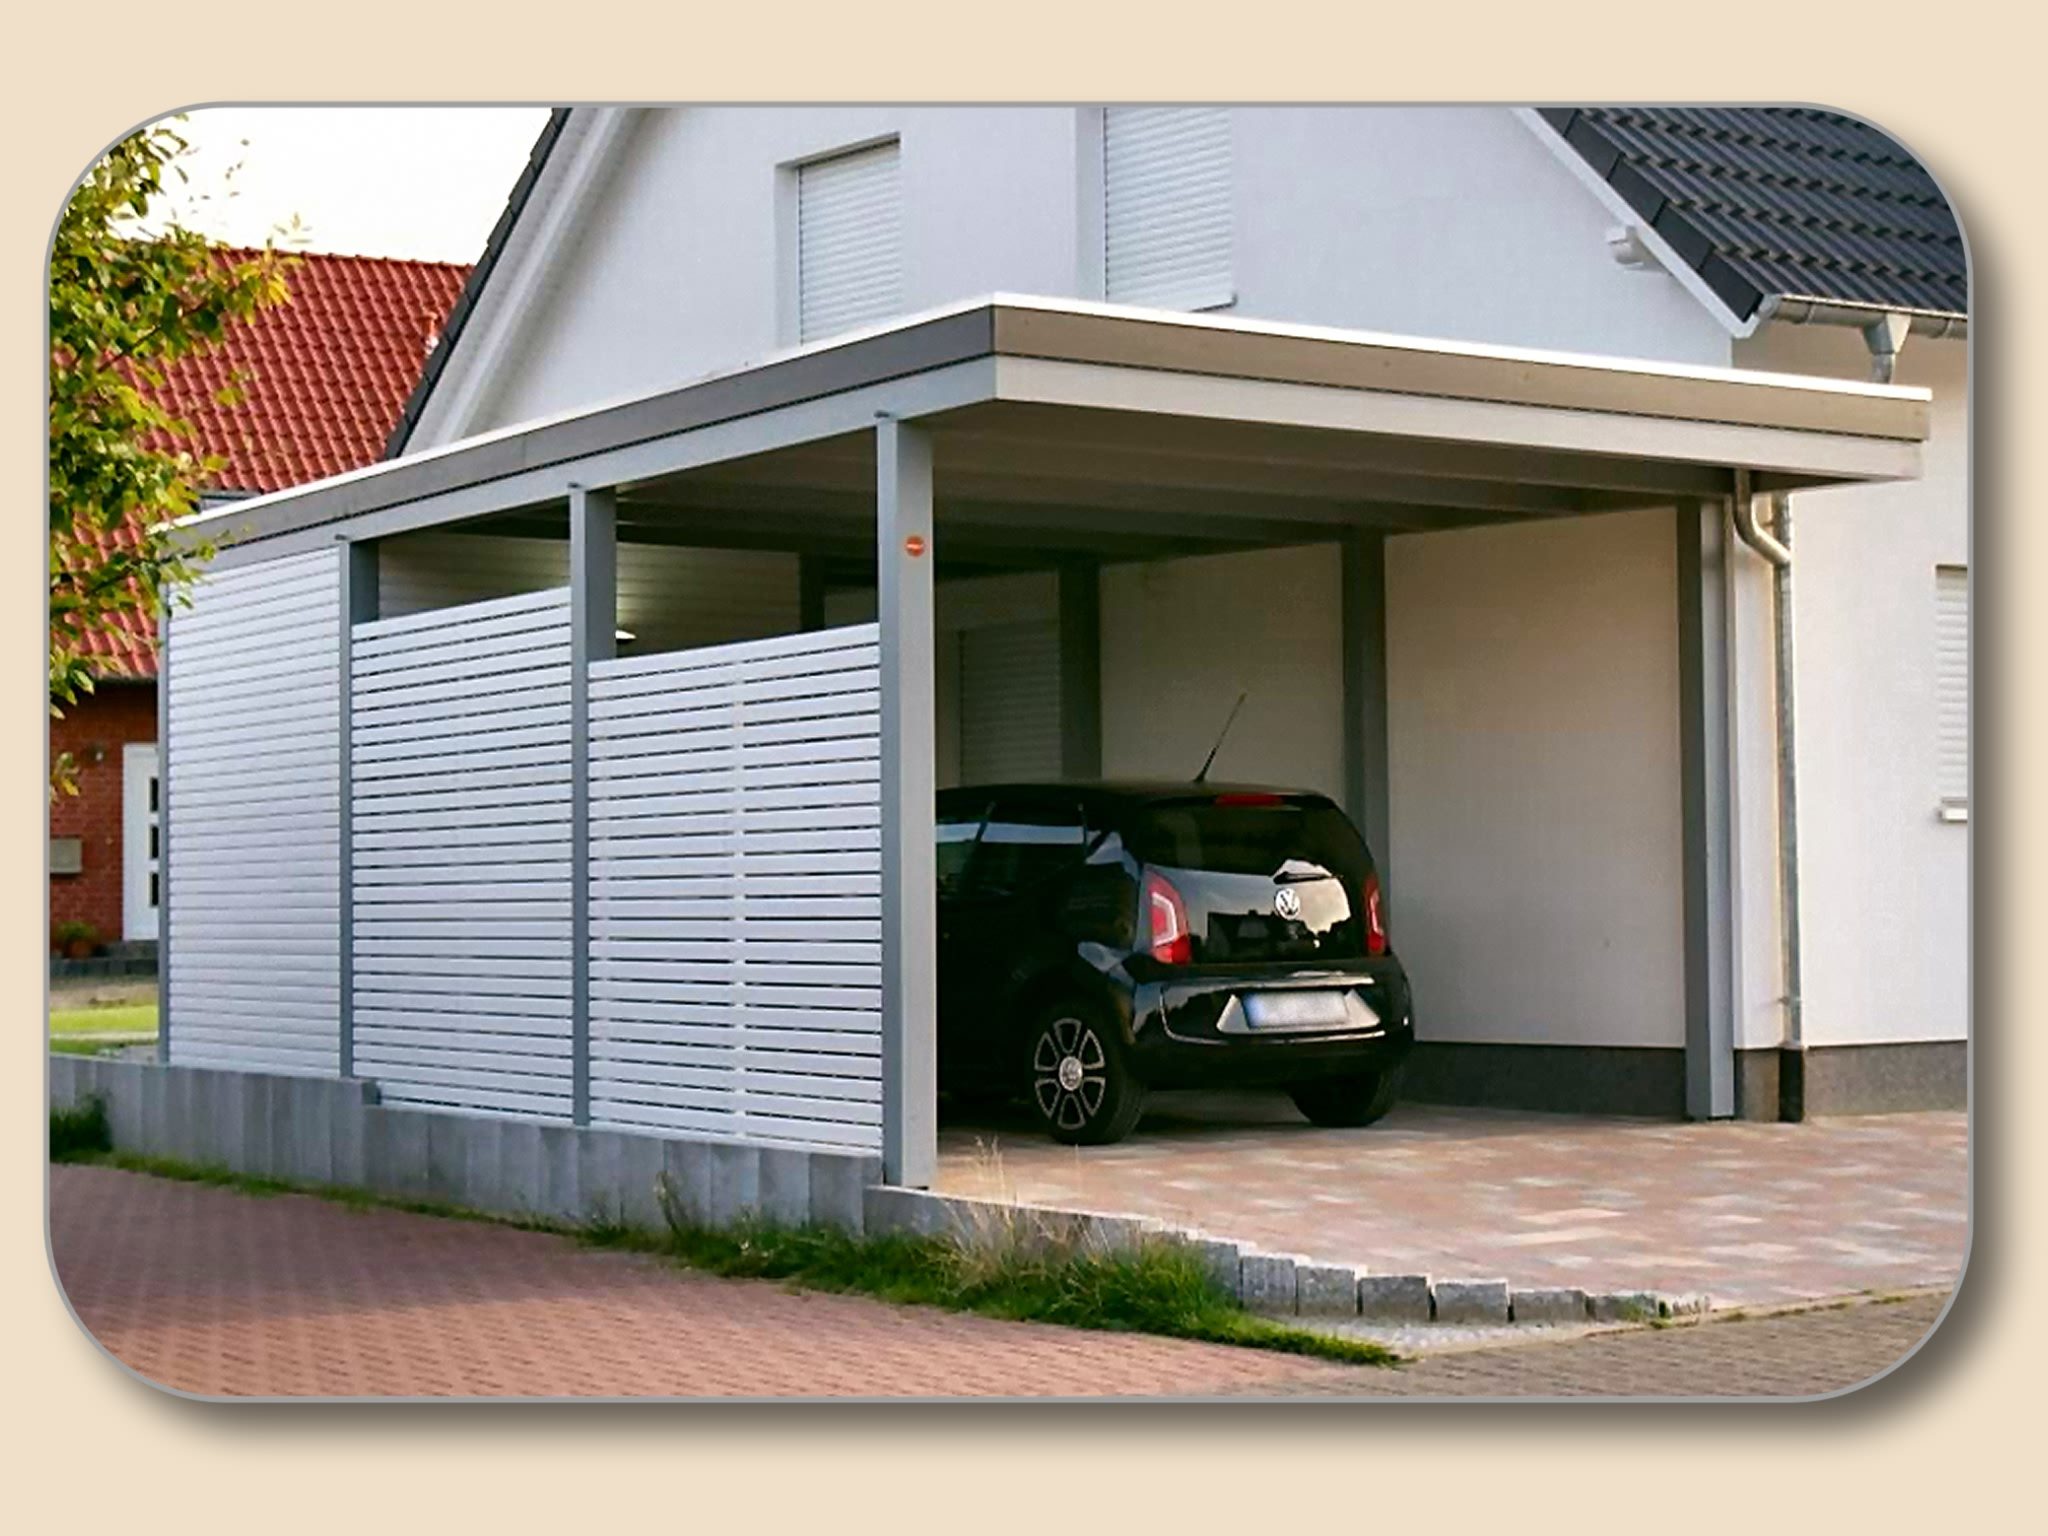 Full Size of Gartensauna Bausatz Carport Wohnzimmer Gartensauna Bausatz